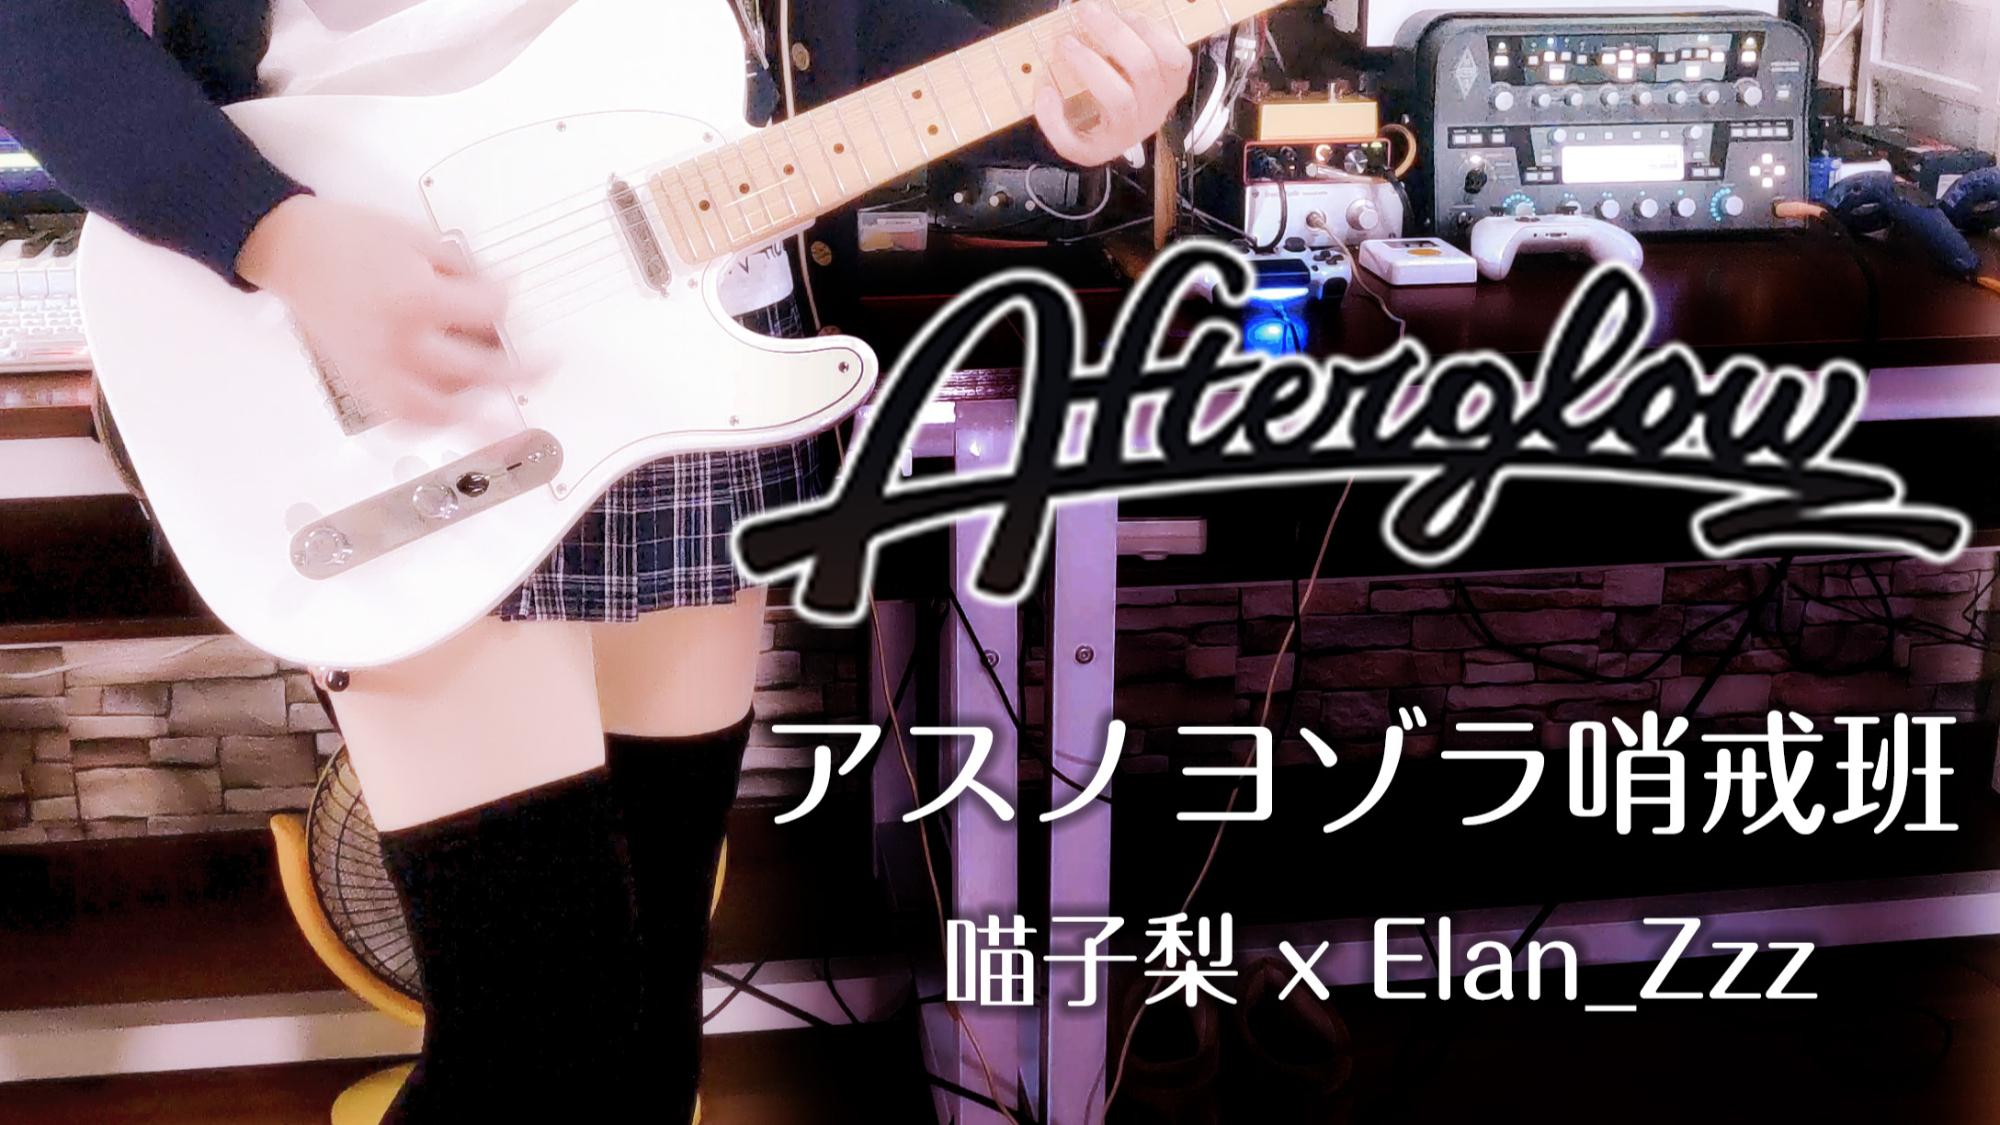 [Afterglow]アスノヨゾラ哨戒班 喵子梨 x Elan_Zzz 电吉他翻弹 cov